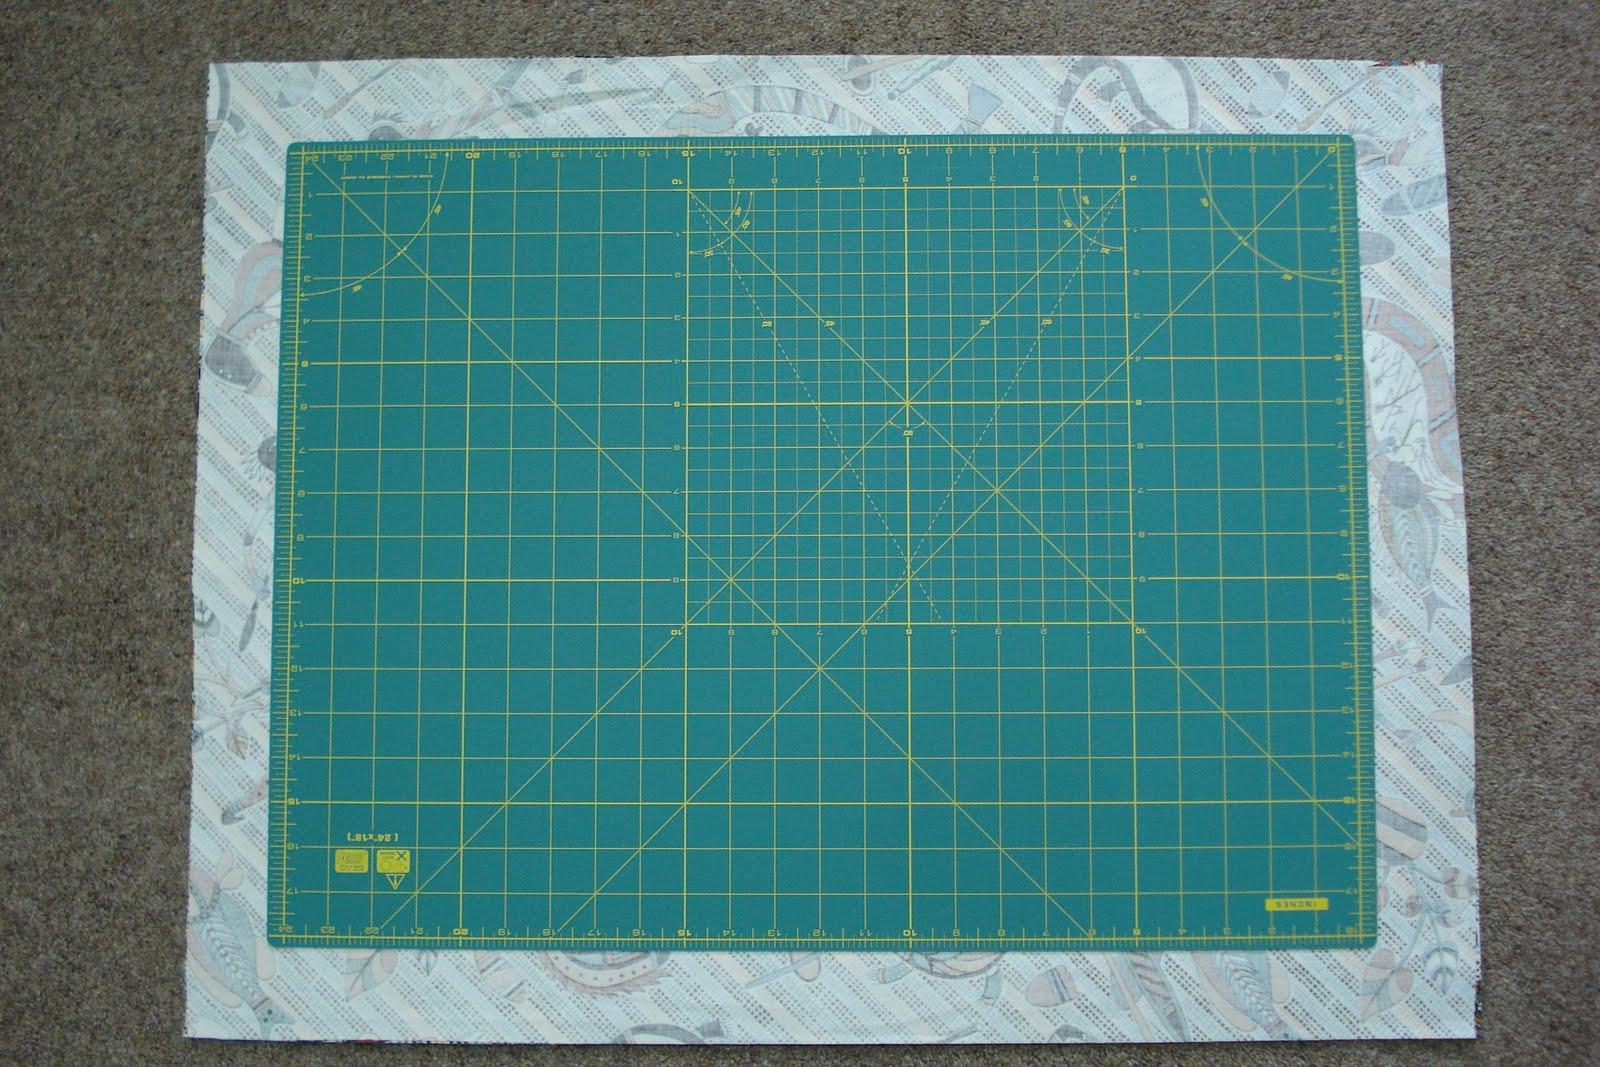 Angie Quilts Mat Amp Ruler Bag Part 1